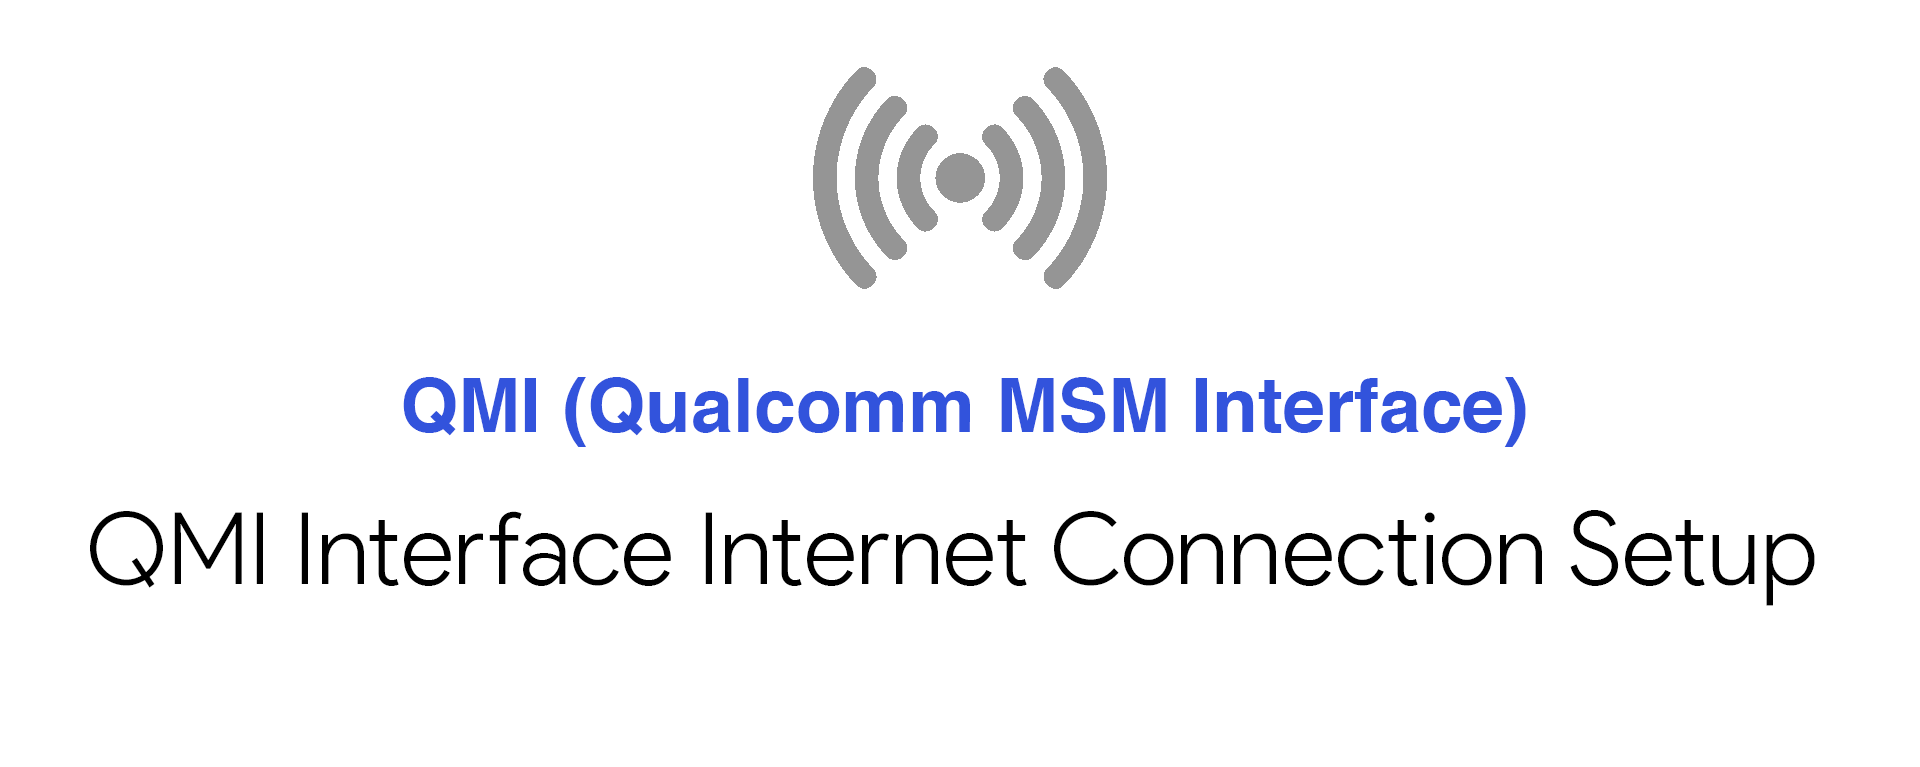 QMI Interface Internet Connection Setup Using Sixfab Shield/HAT